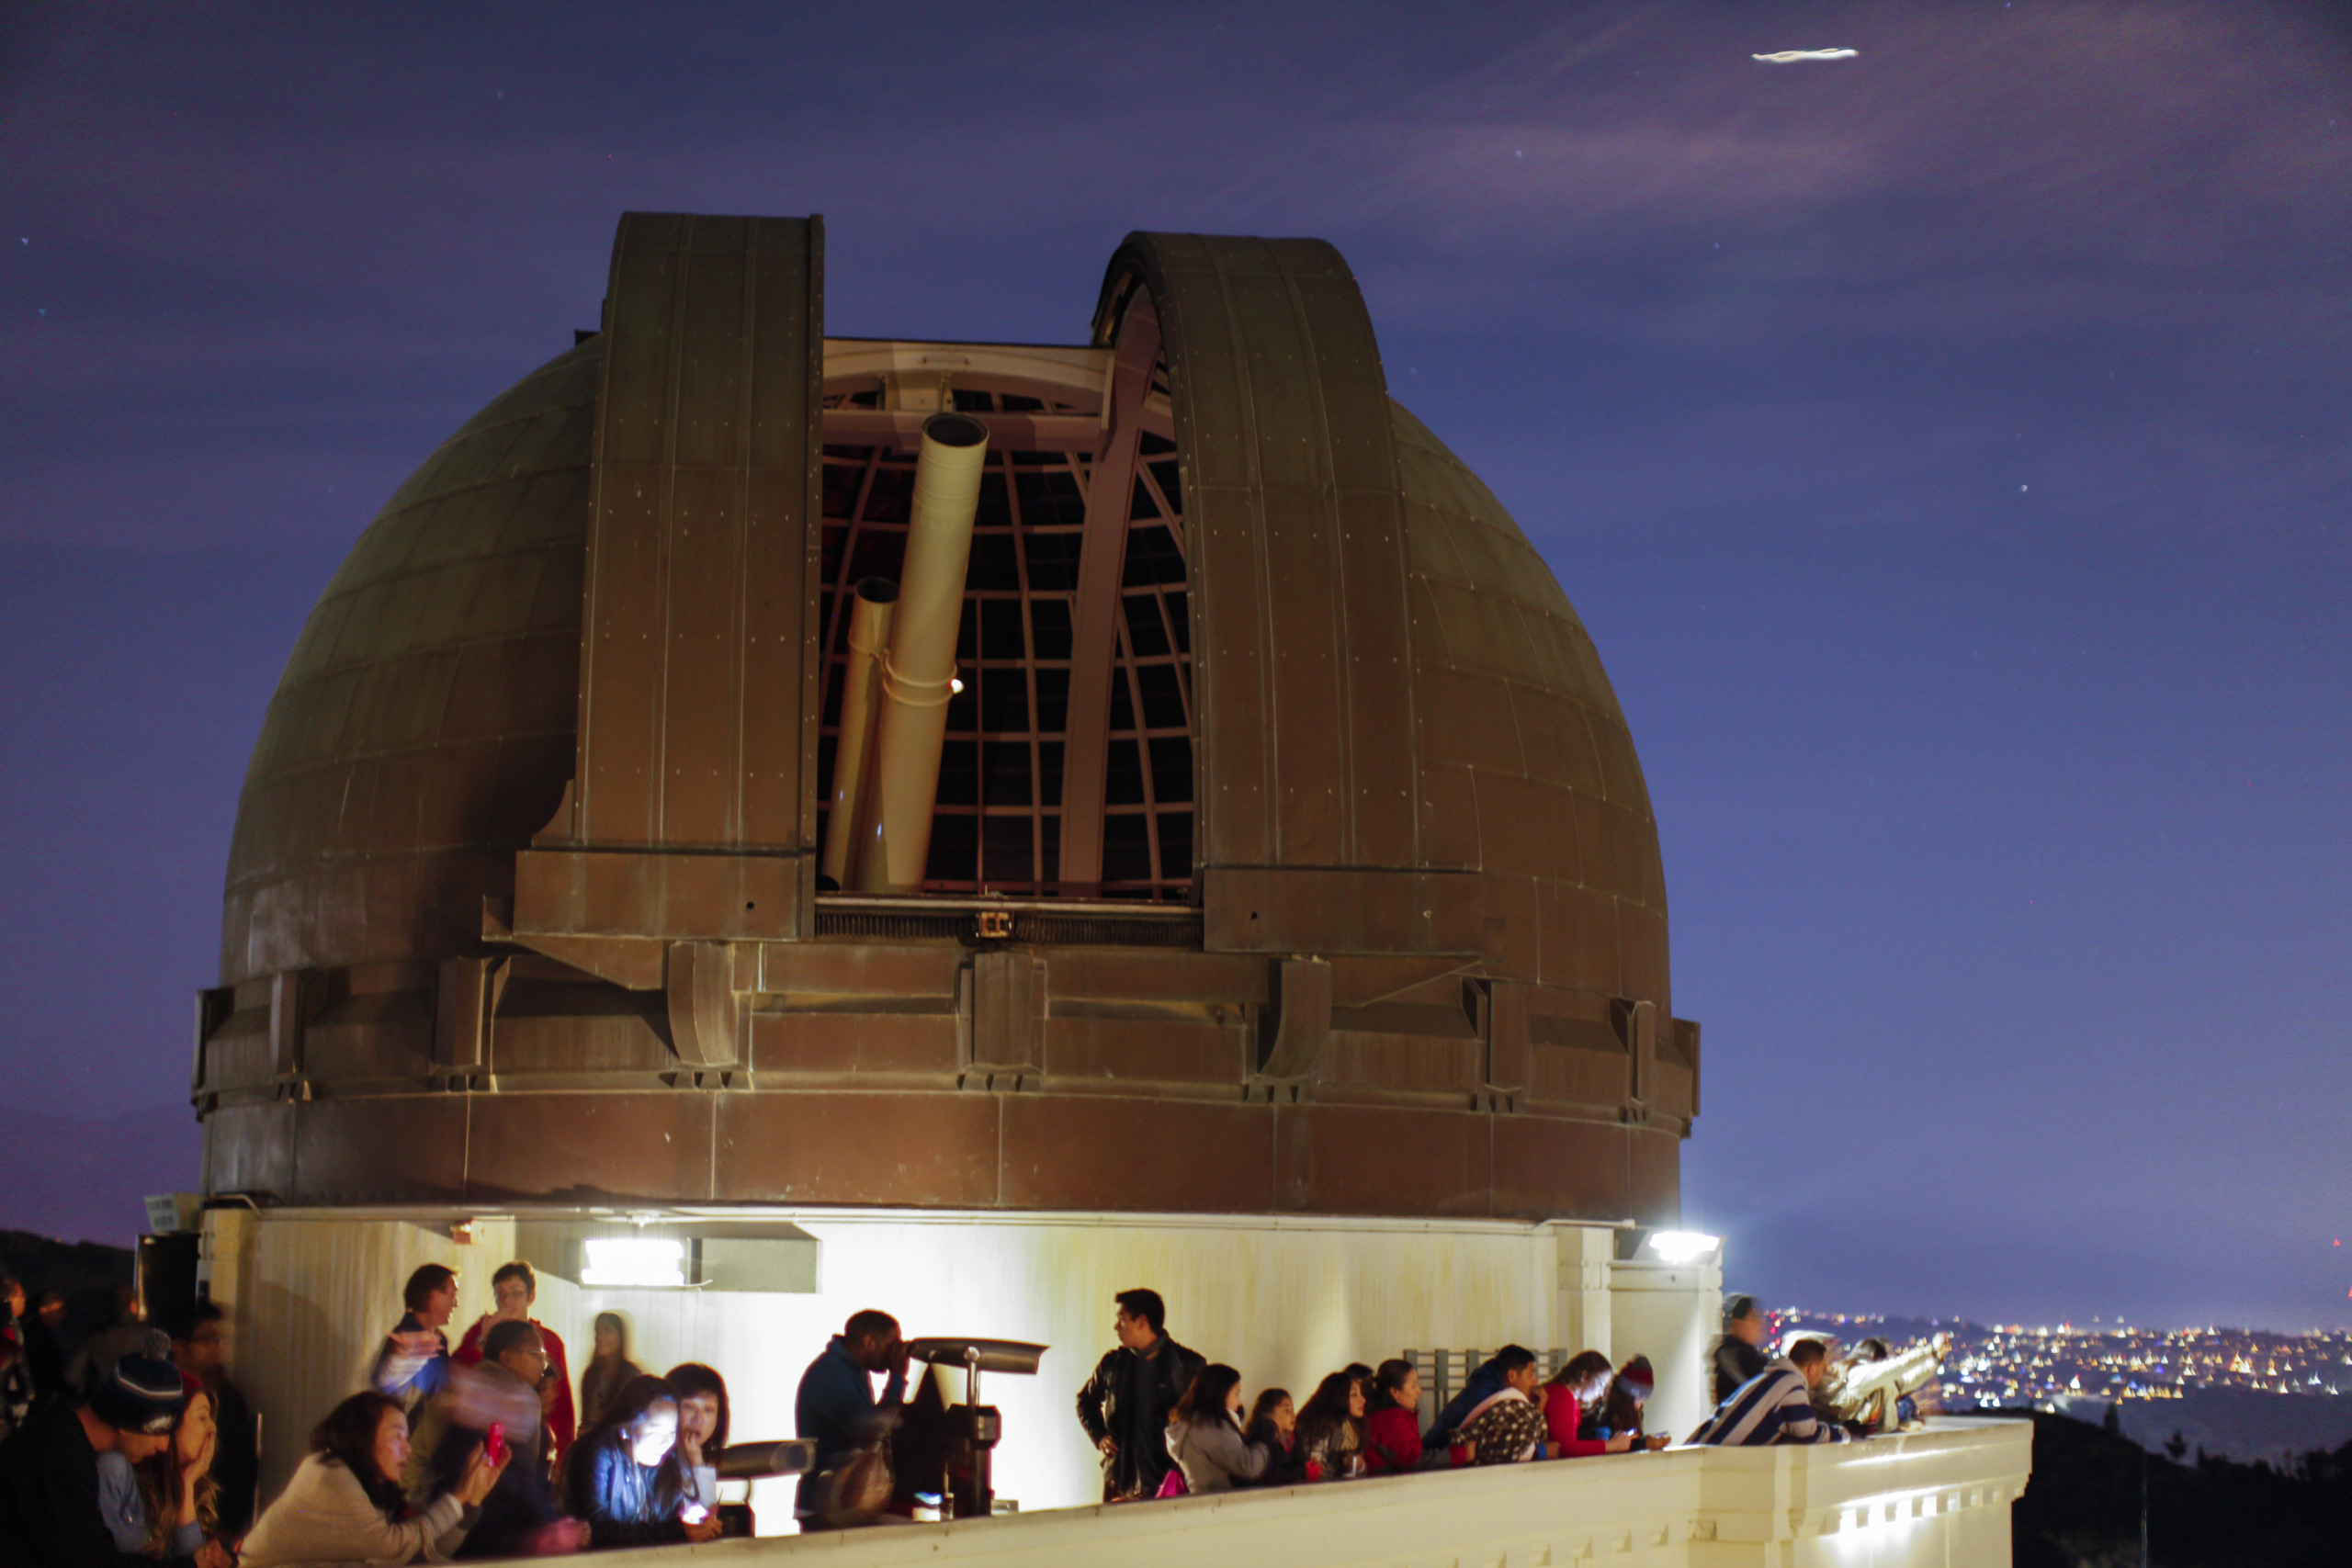 Astronomi Som Turistattraktion